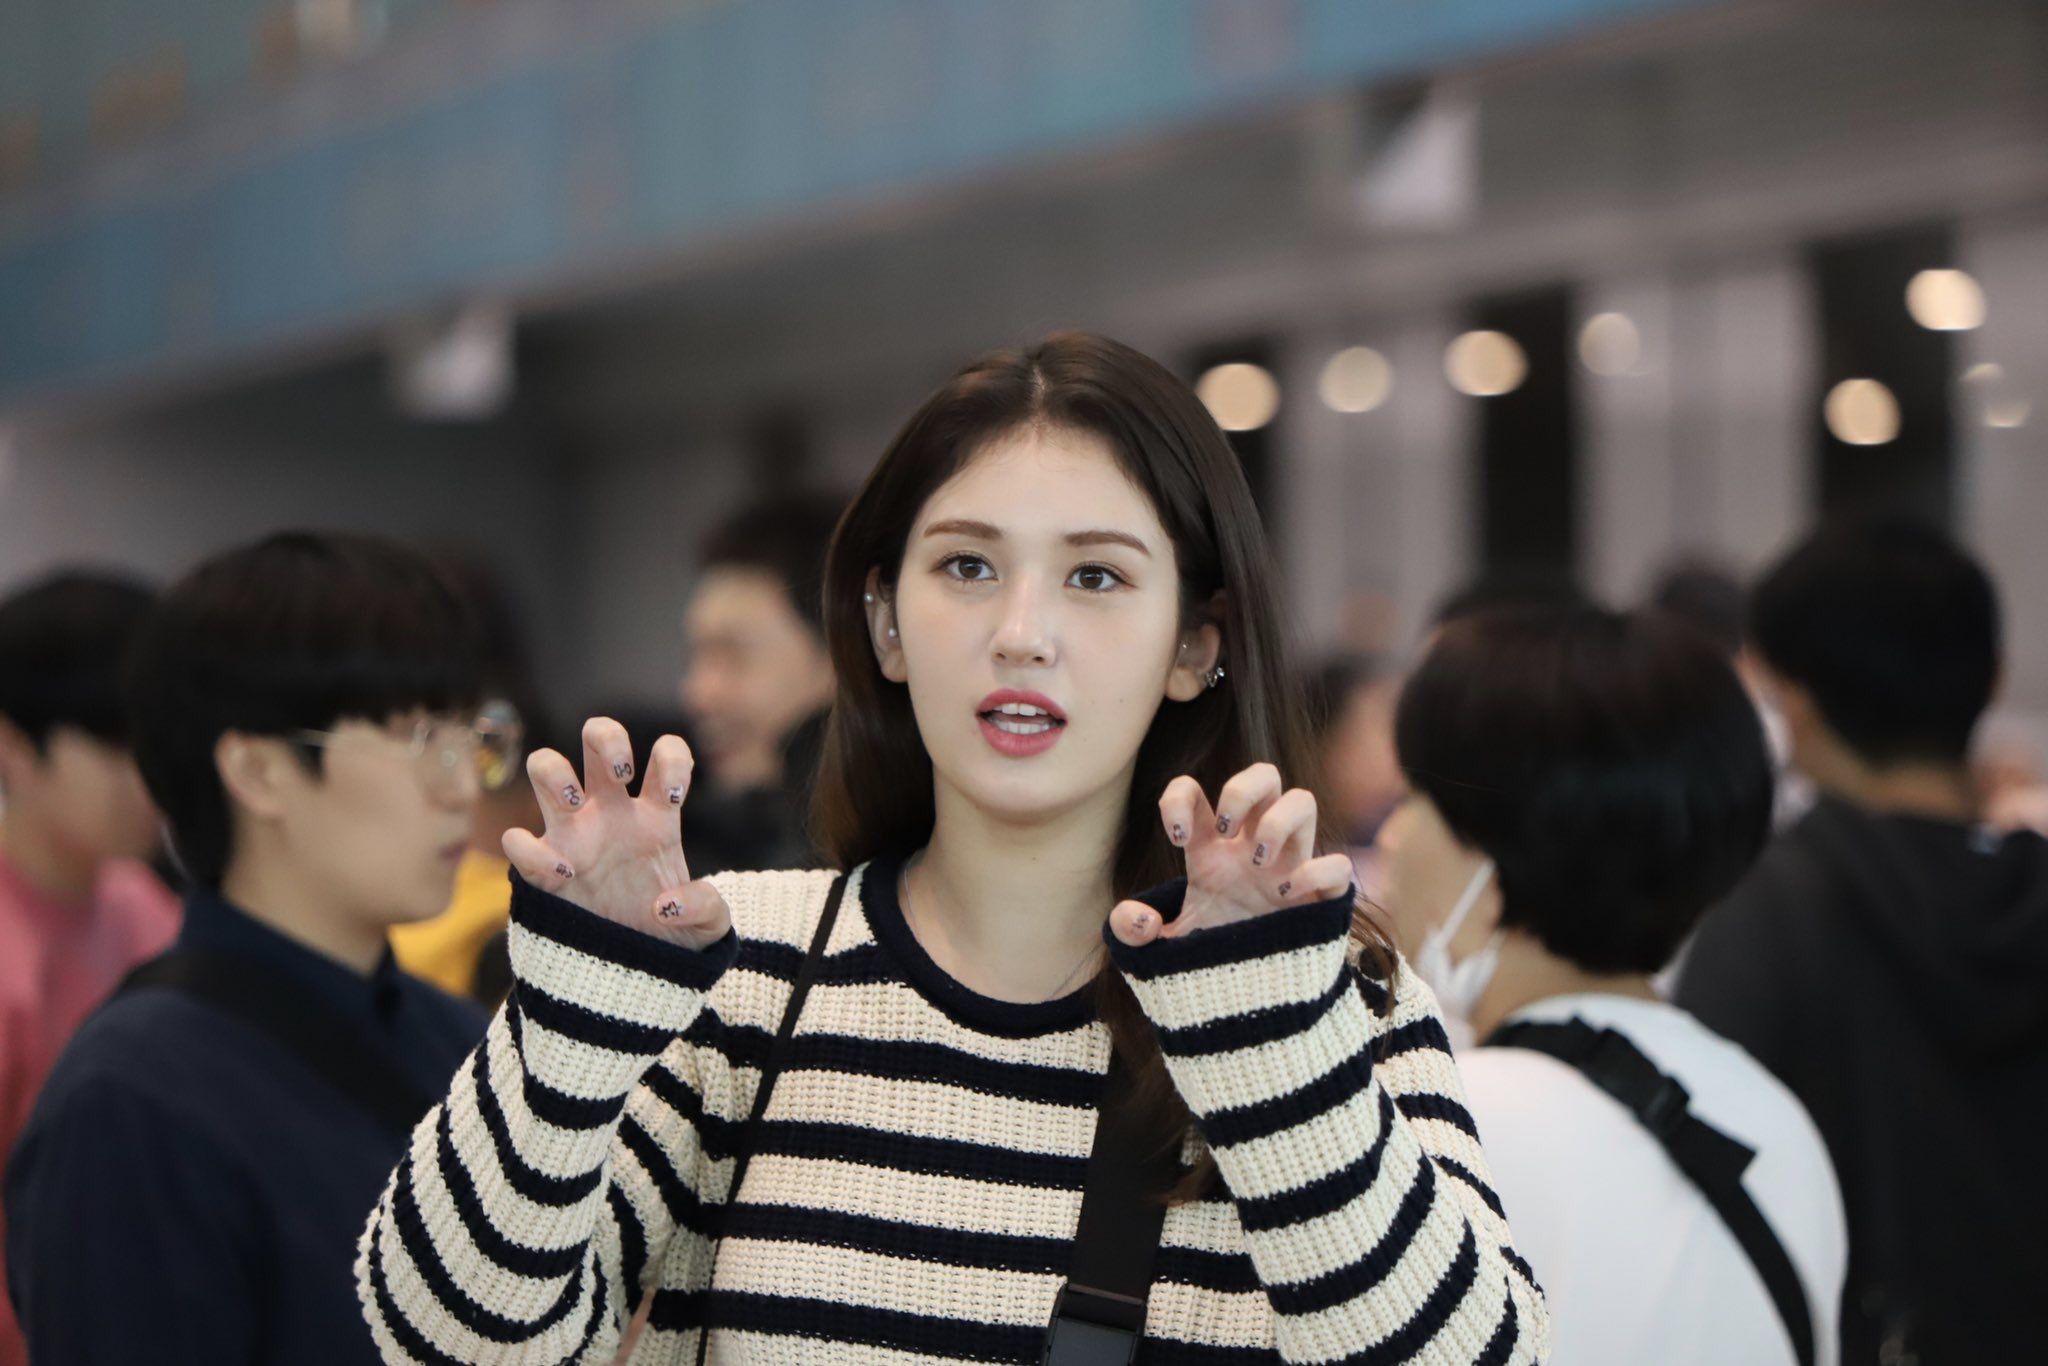 Jeonsomi Somi Ioi Blacklabel Jyp Cutie Love Kpop Korean Canadian Blackpink Twice Chungha Nct Yg Nct Rain